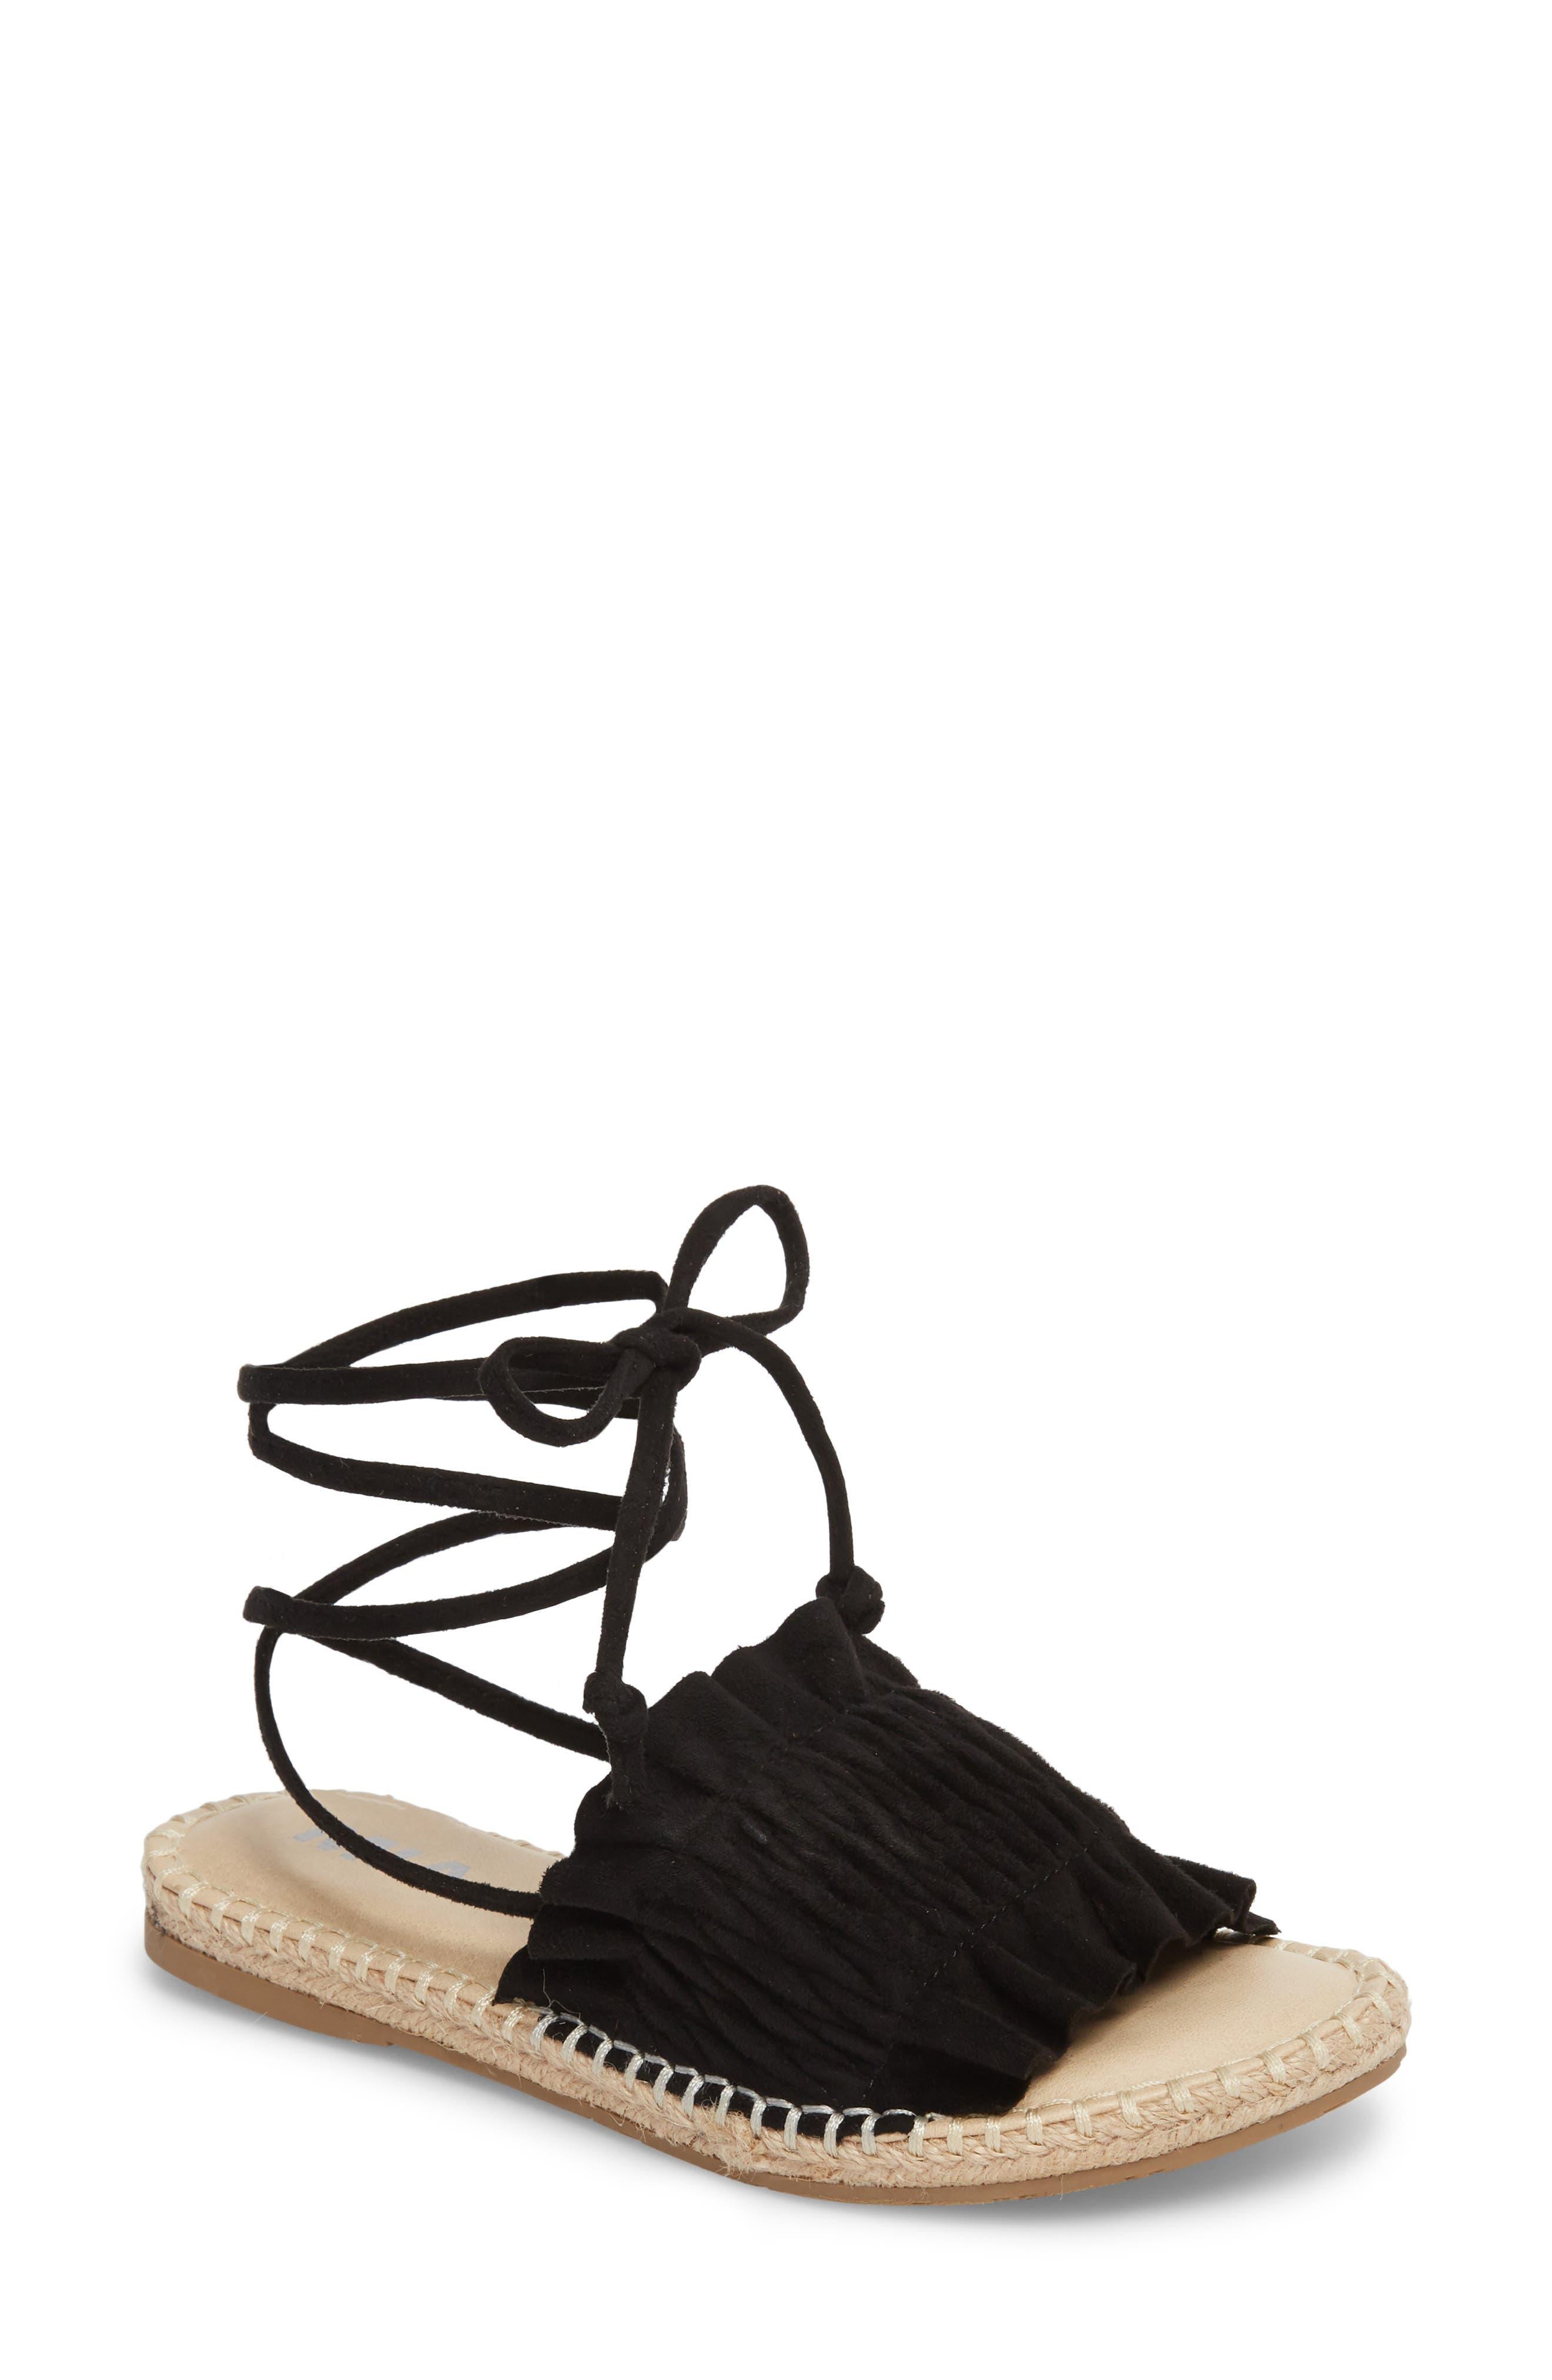 Annalise Sandal,                         Main,                         color, BLACK STRETCH NOVA SUEDE